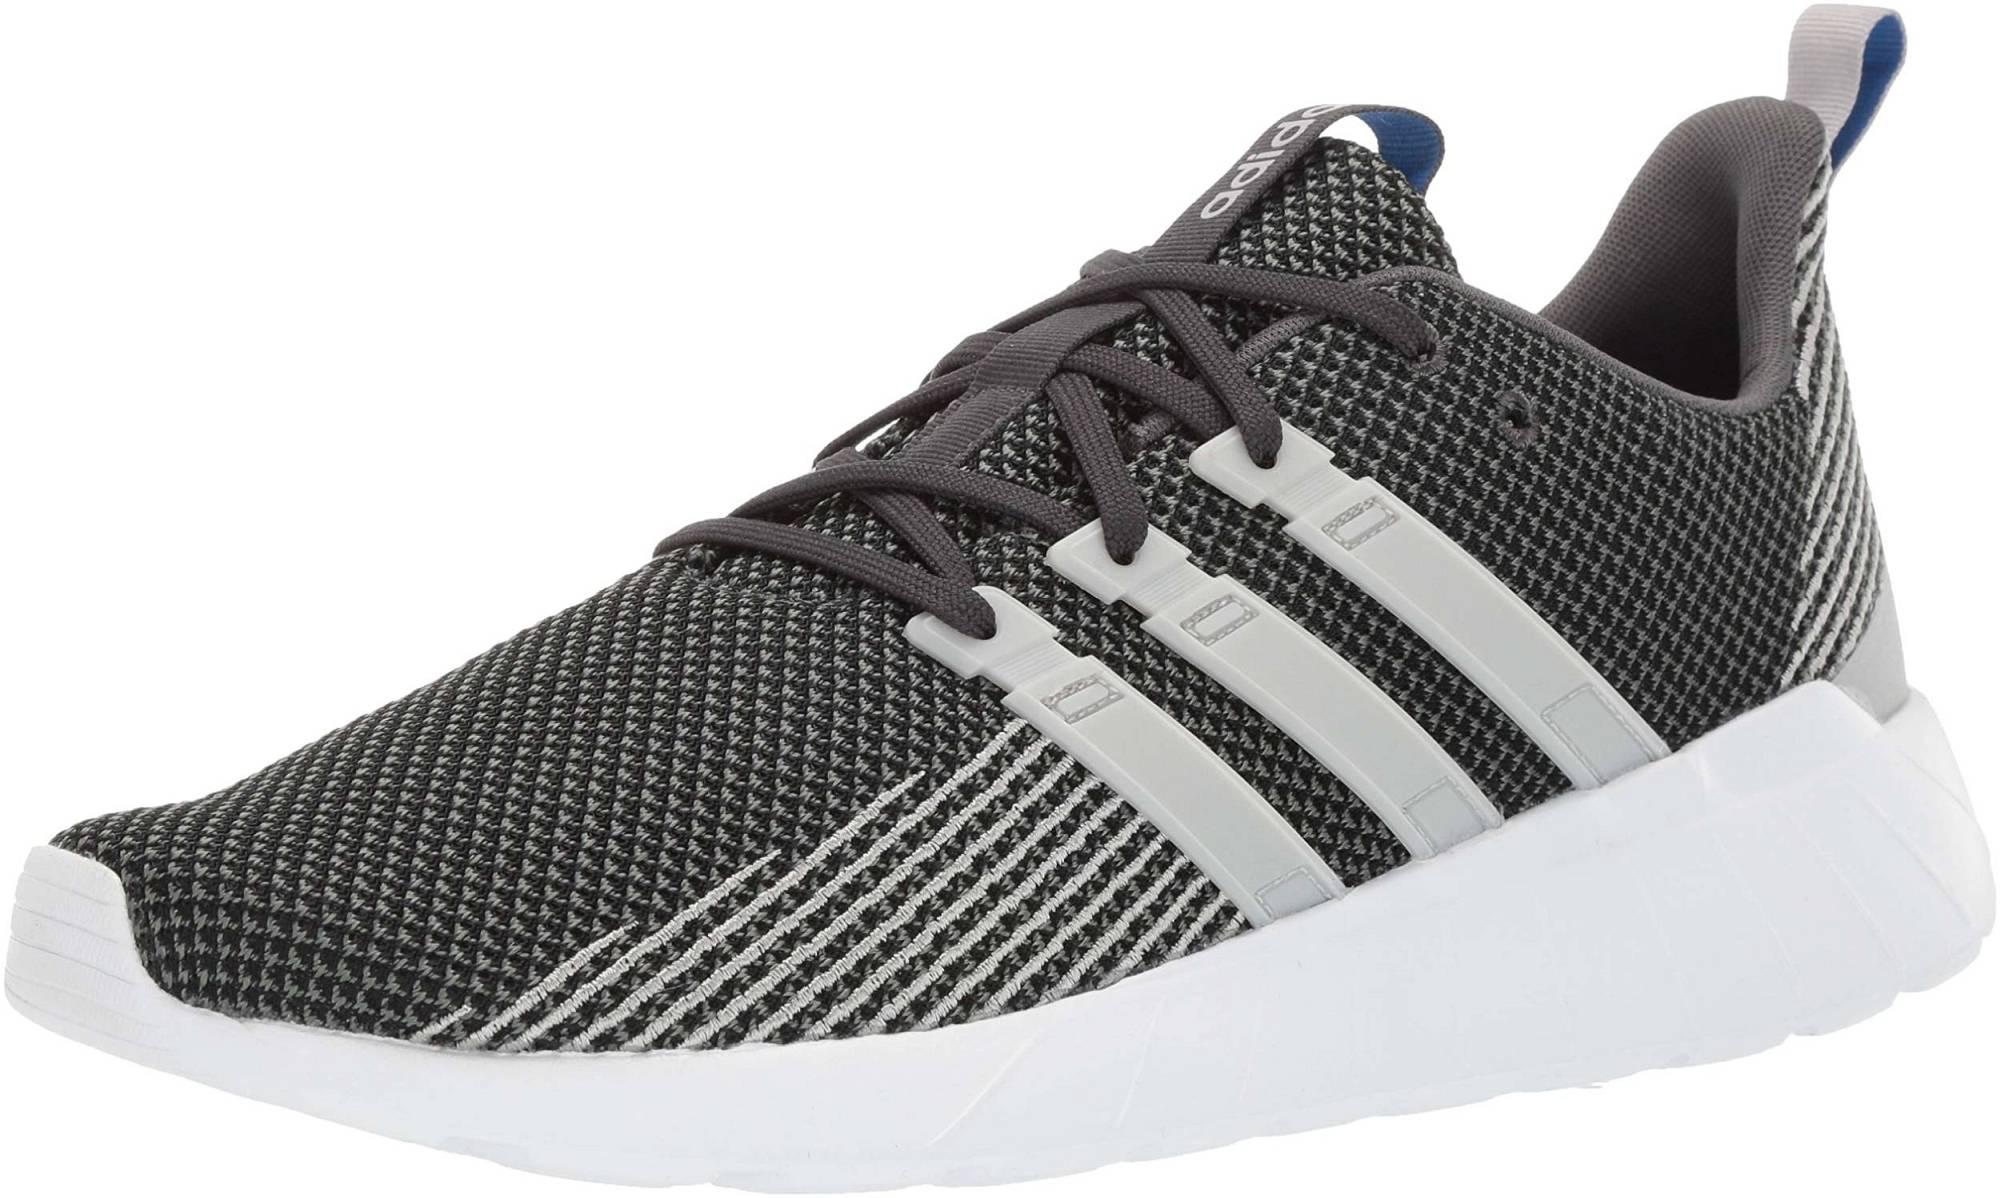 Adidas Questar Flow – Shoes Reviews